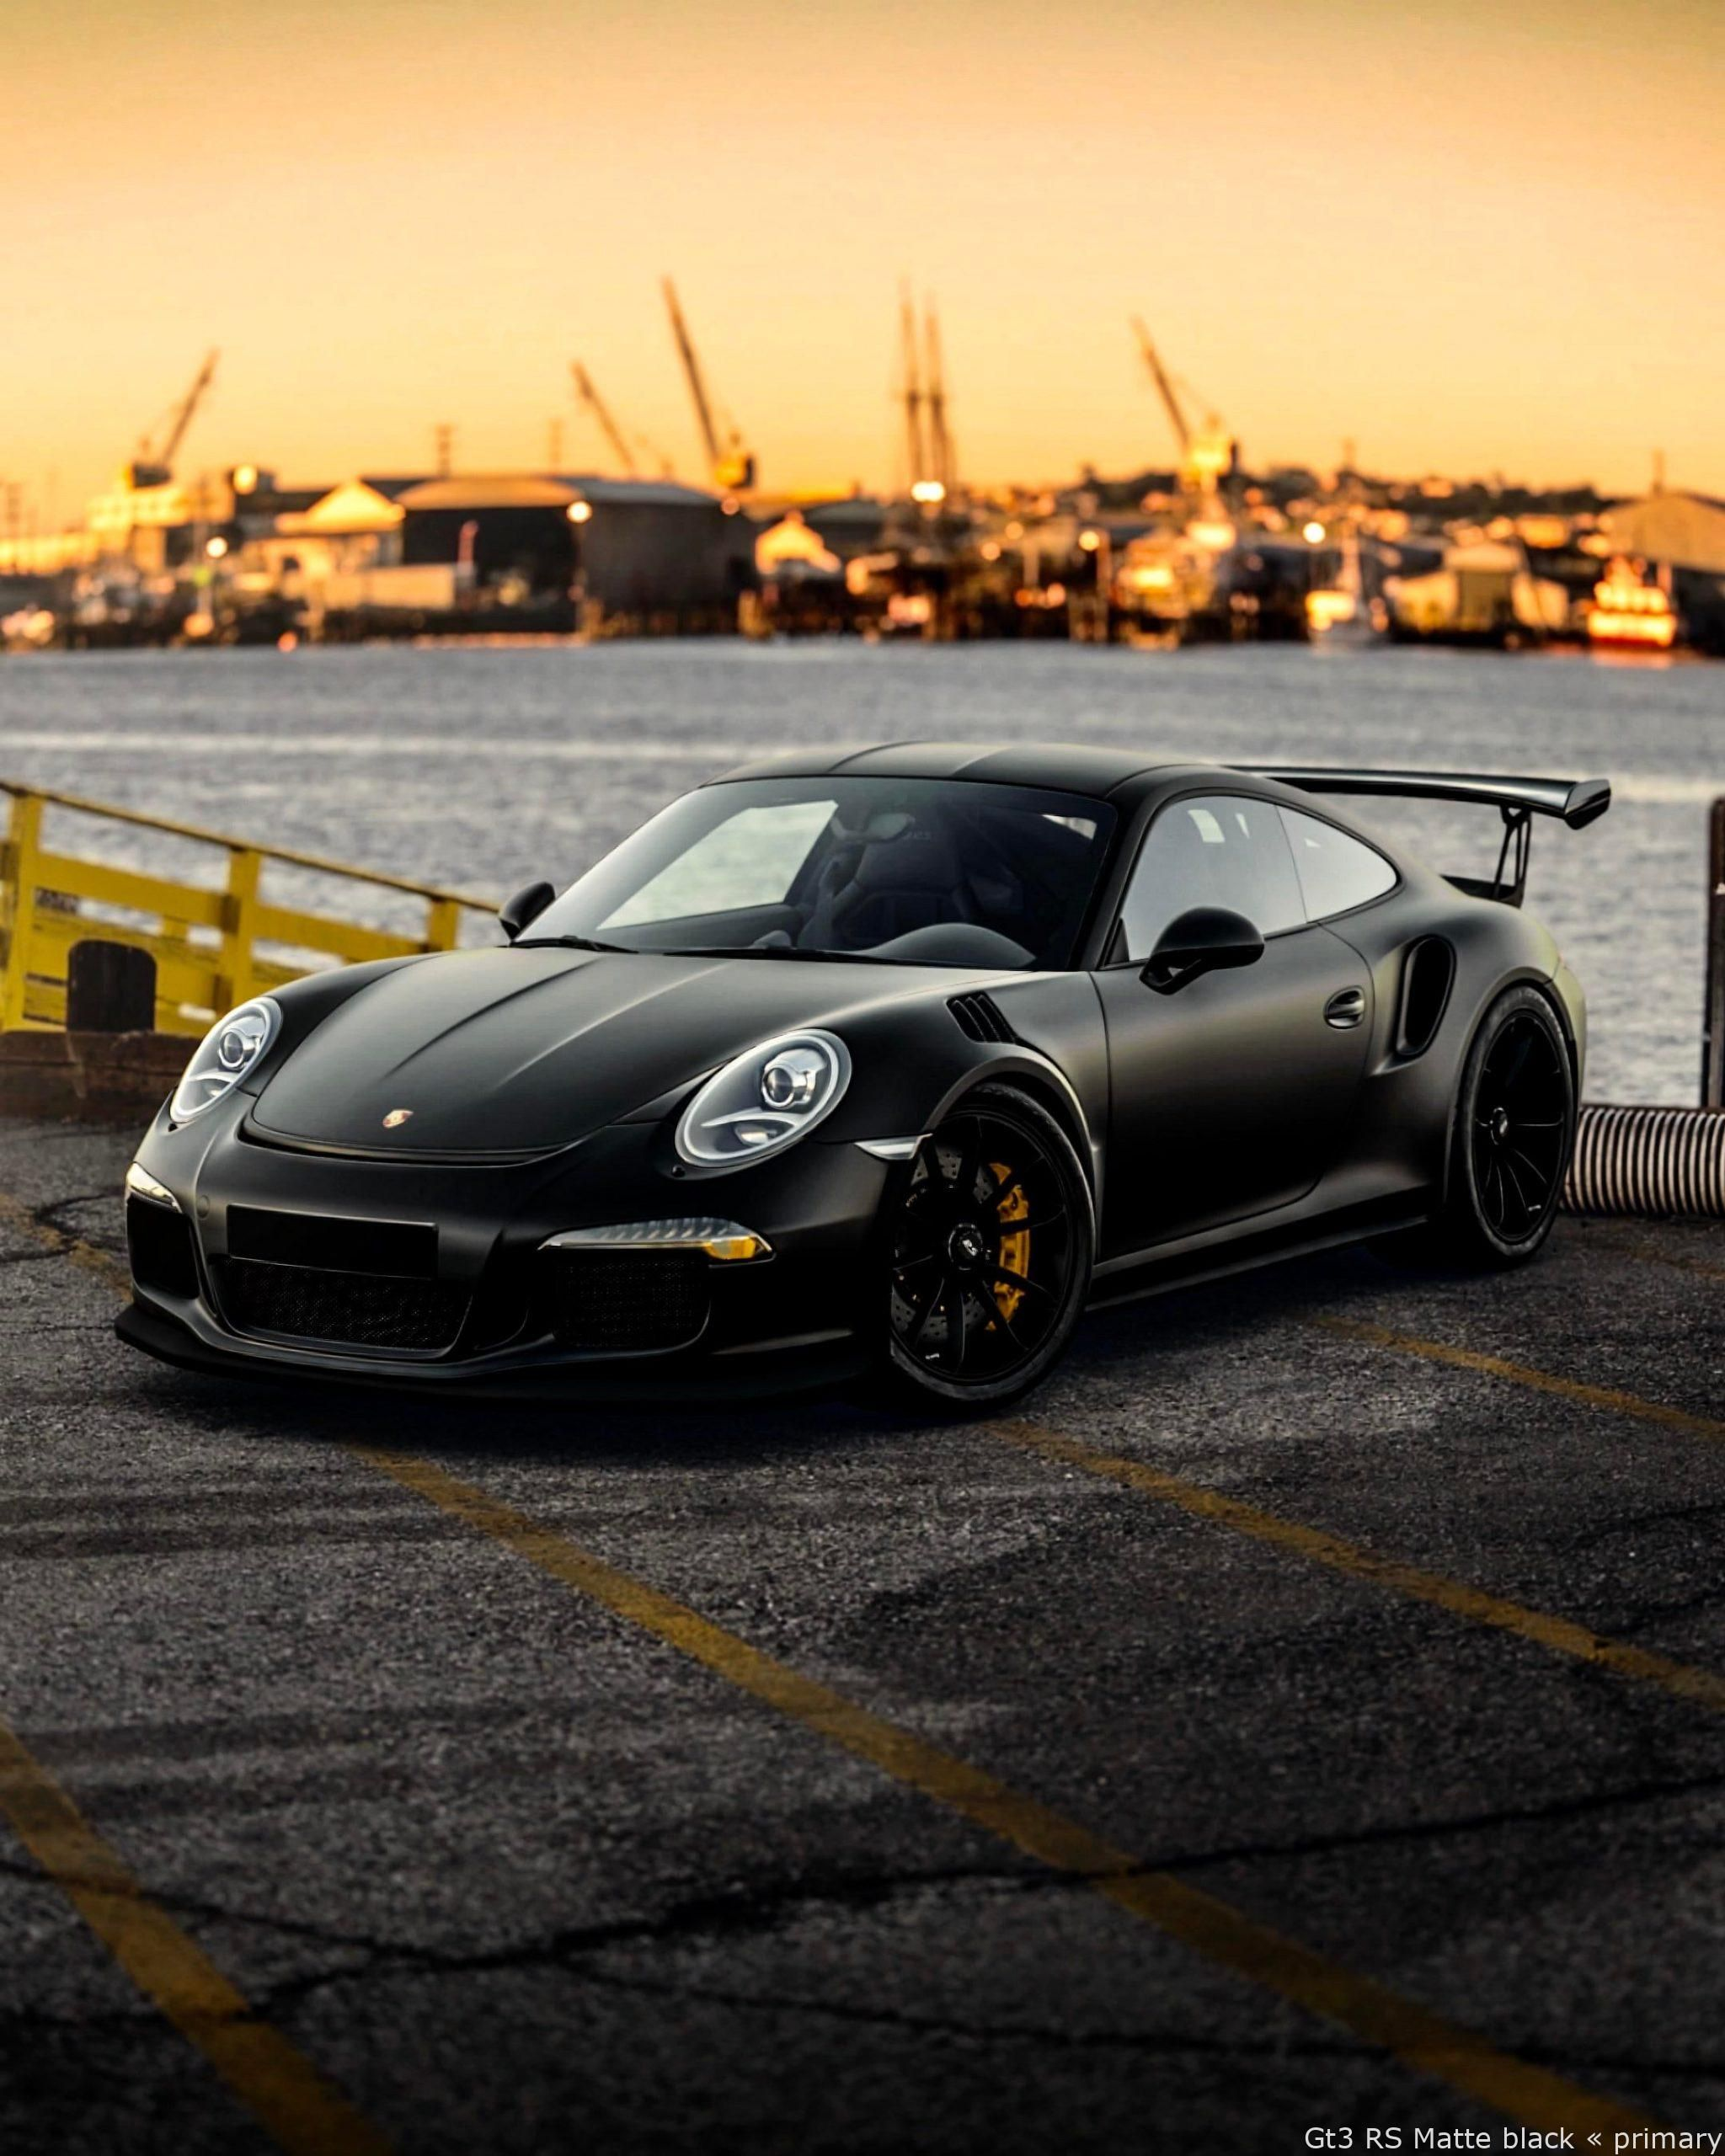 #Cars - Gt3 RS Matte black – formidable